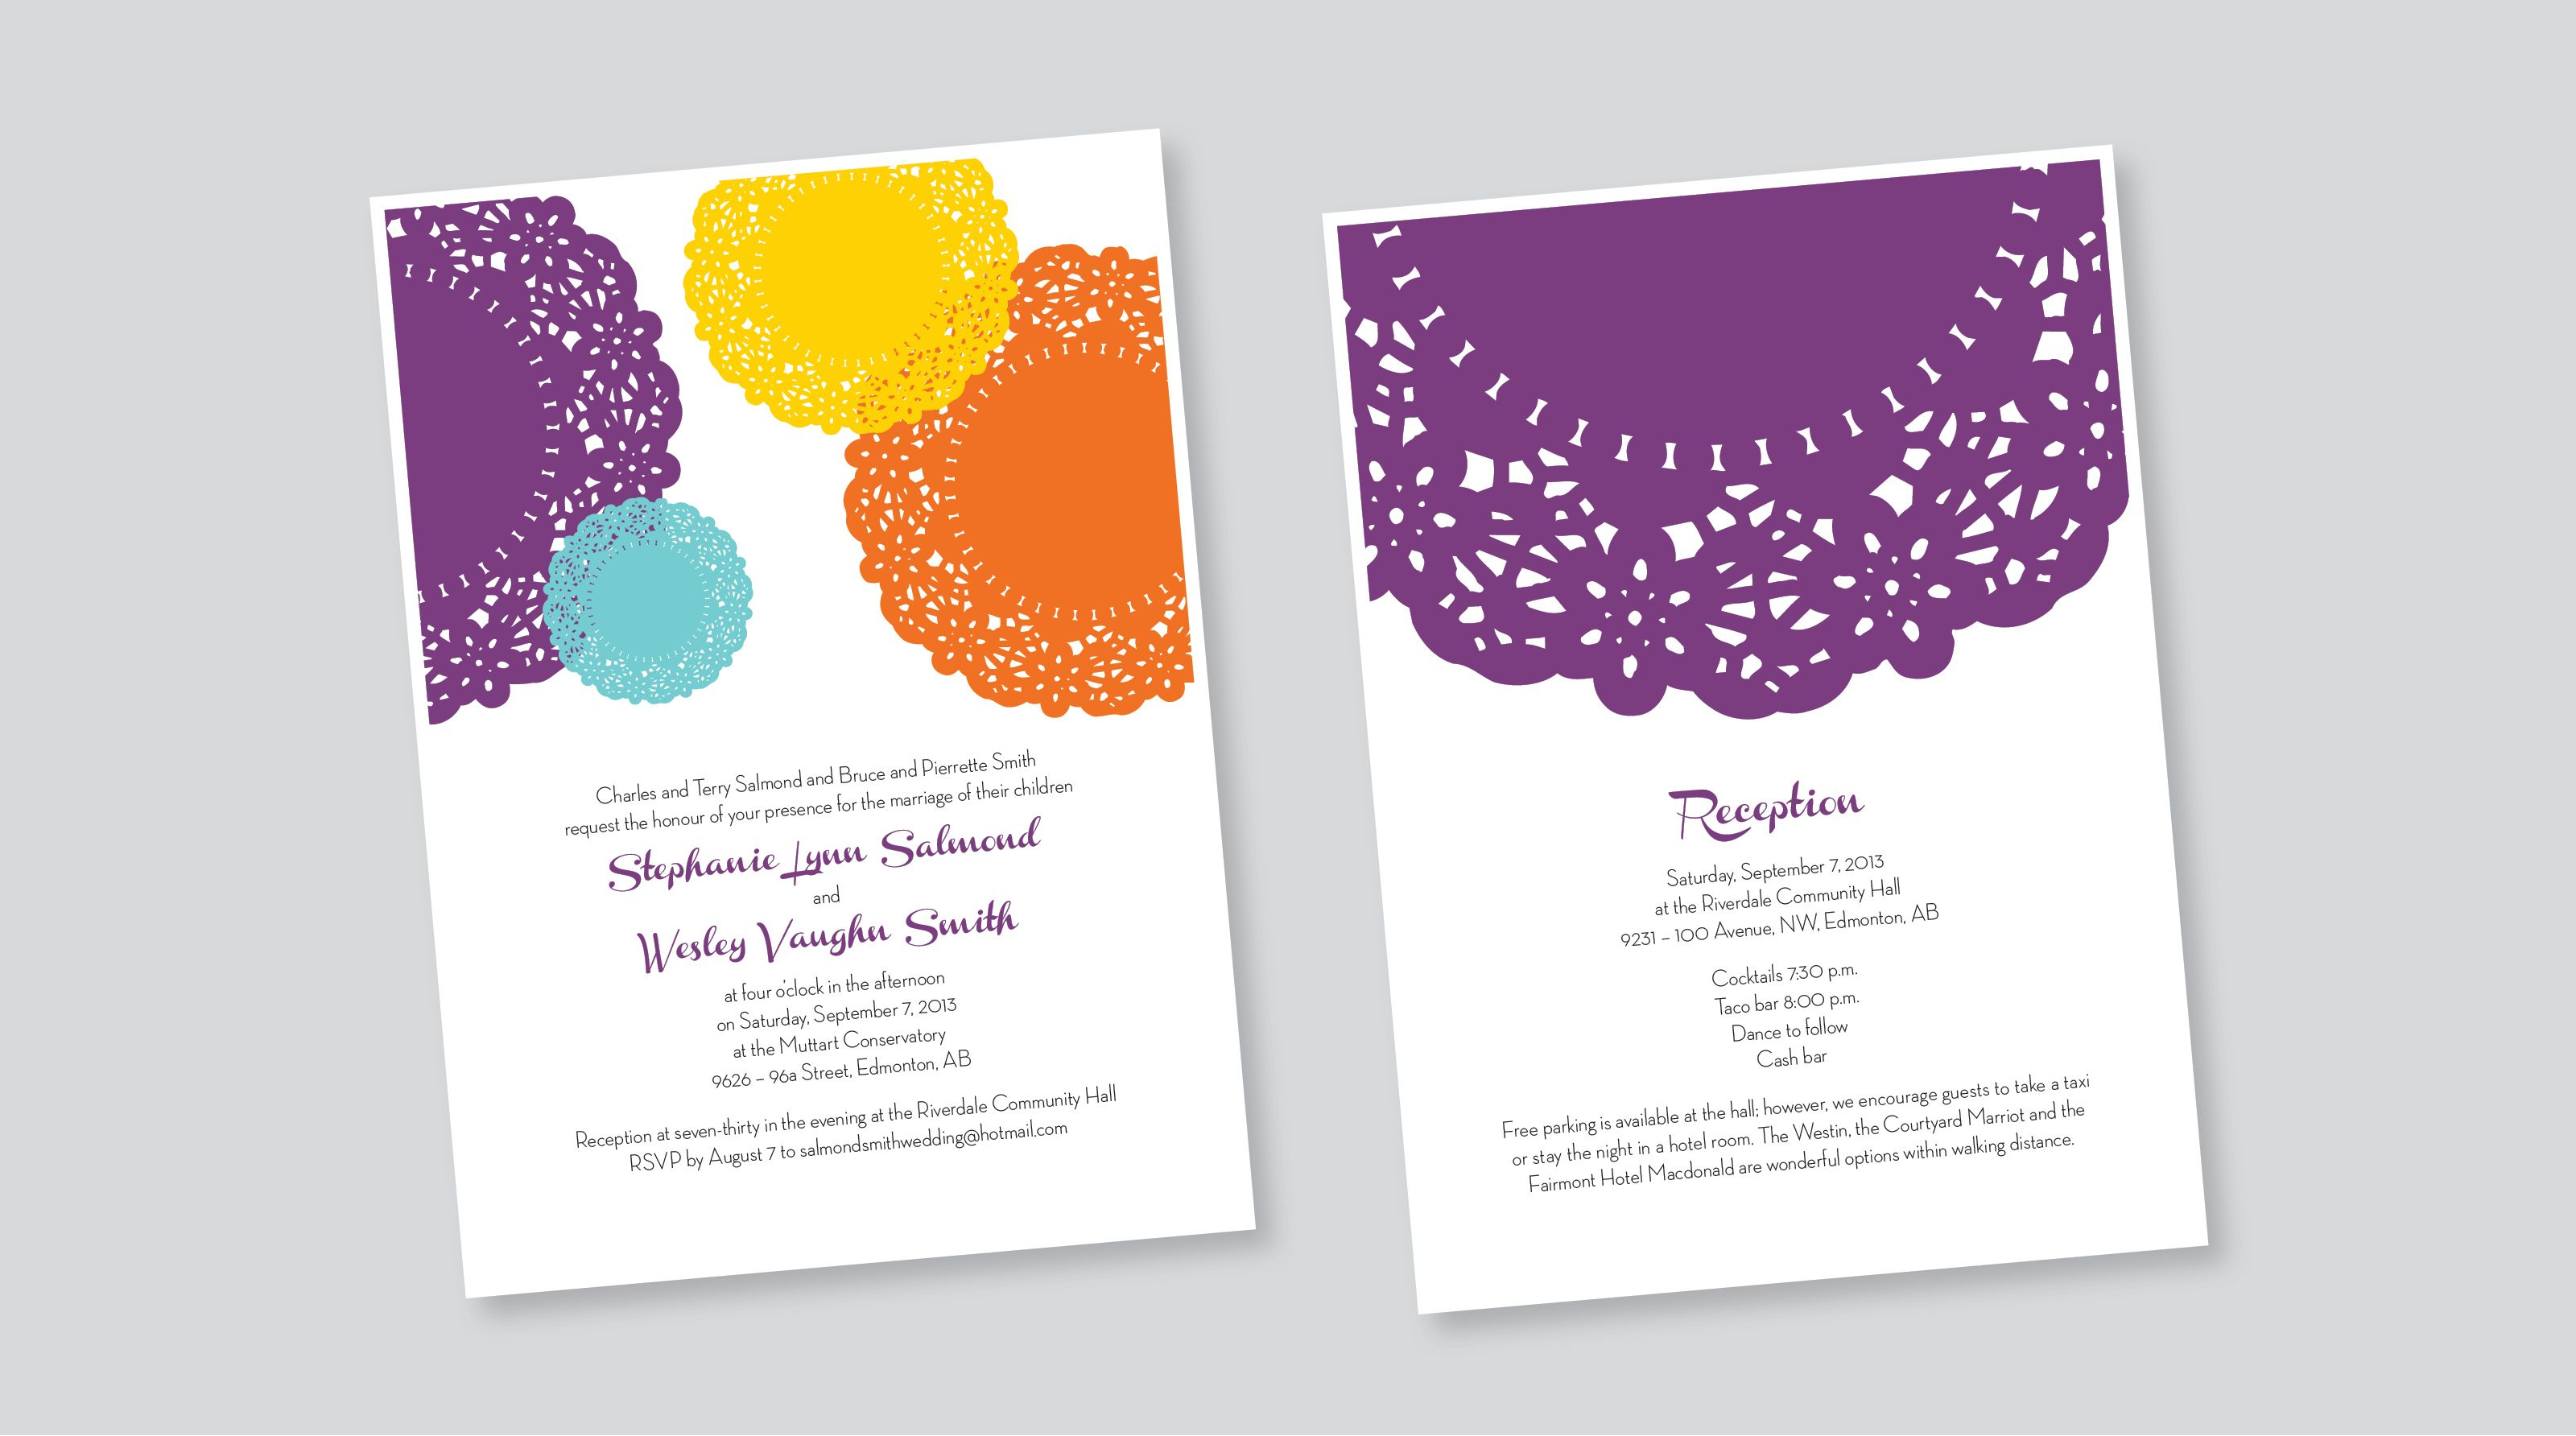 WEDDING INVITATION AND RECEPTION CARD > PRINT DESIGN | Graphic ...